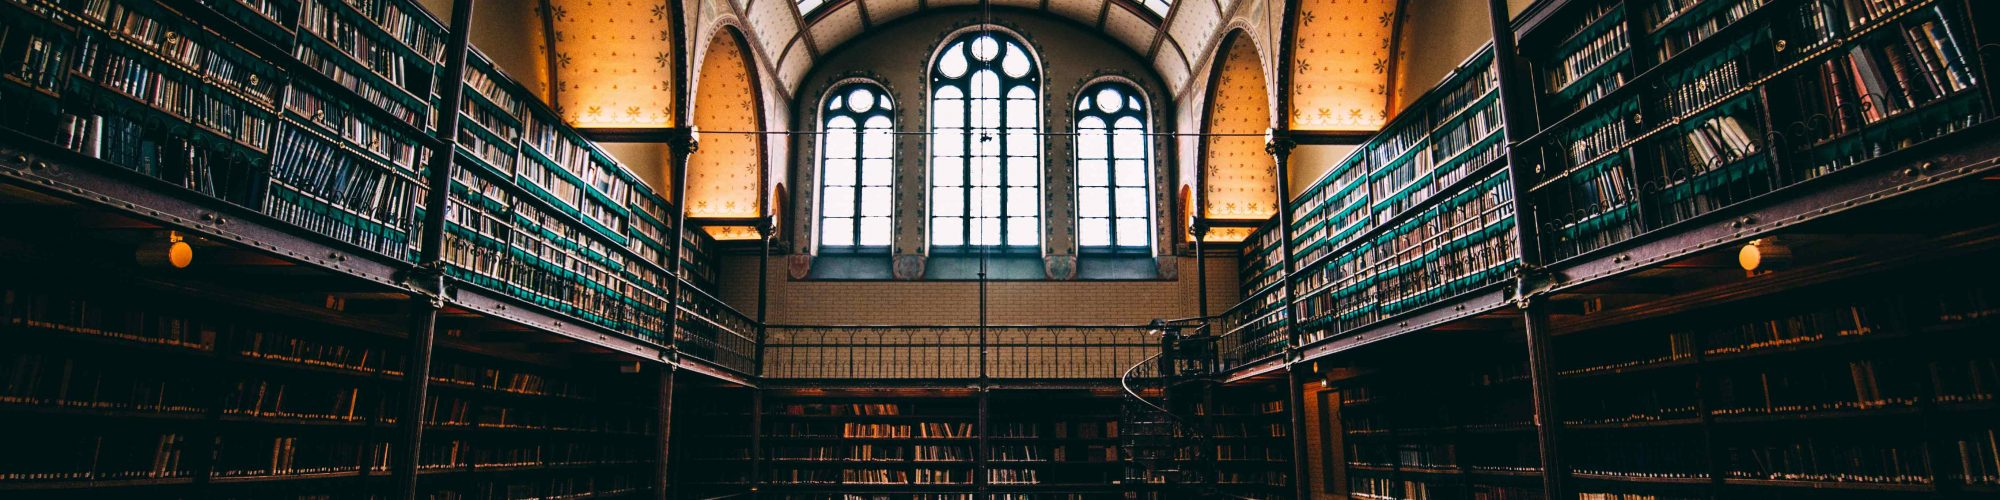 LibrarySkylightSmall.jpg